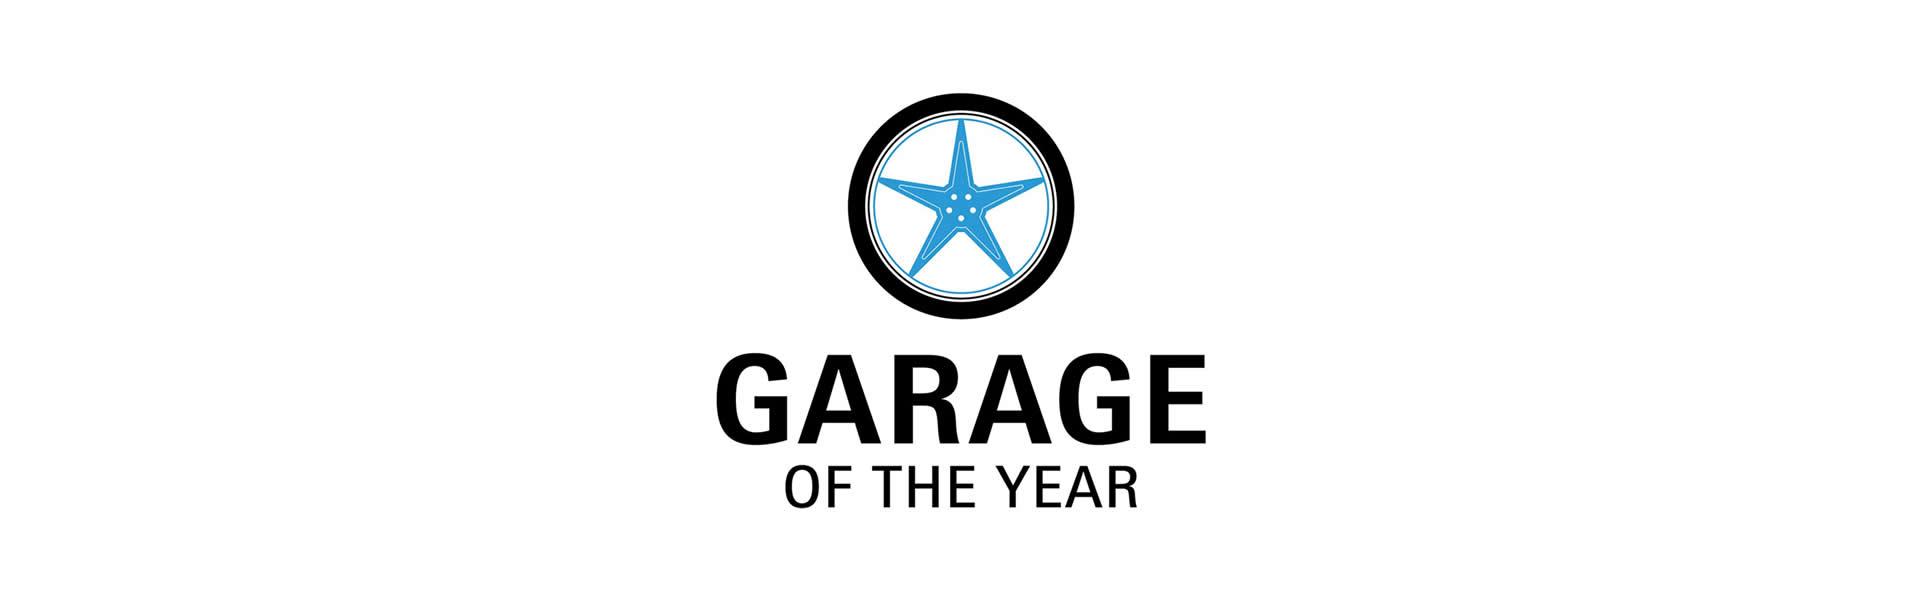 Garage-of-the-year-logo-EAC-Telford 1